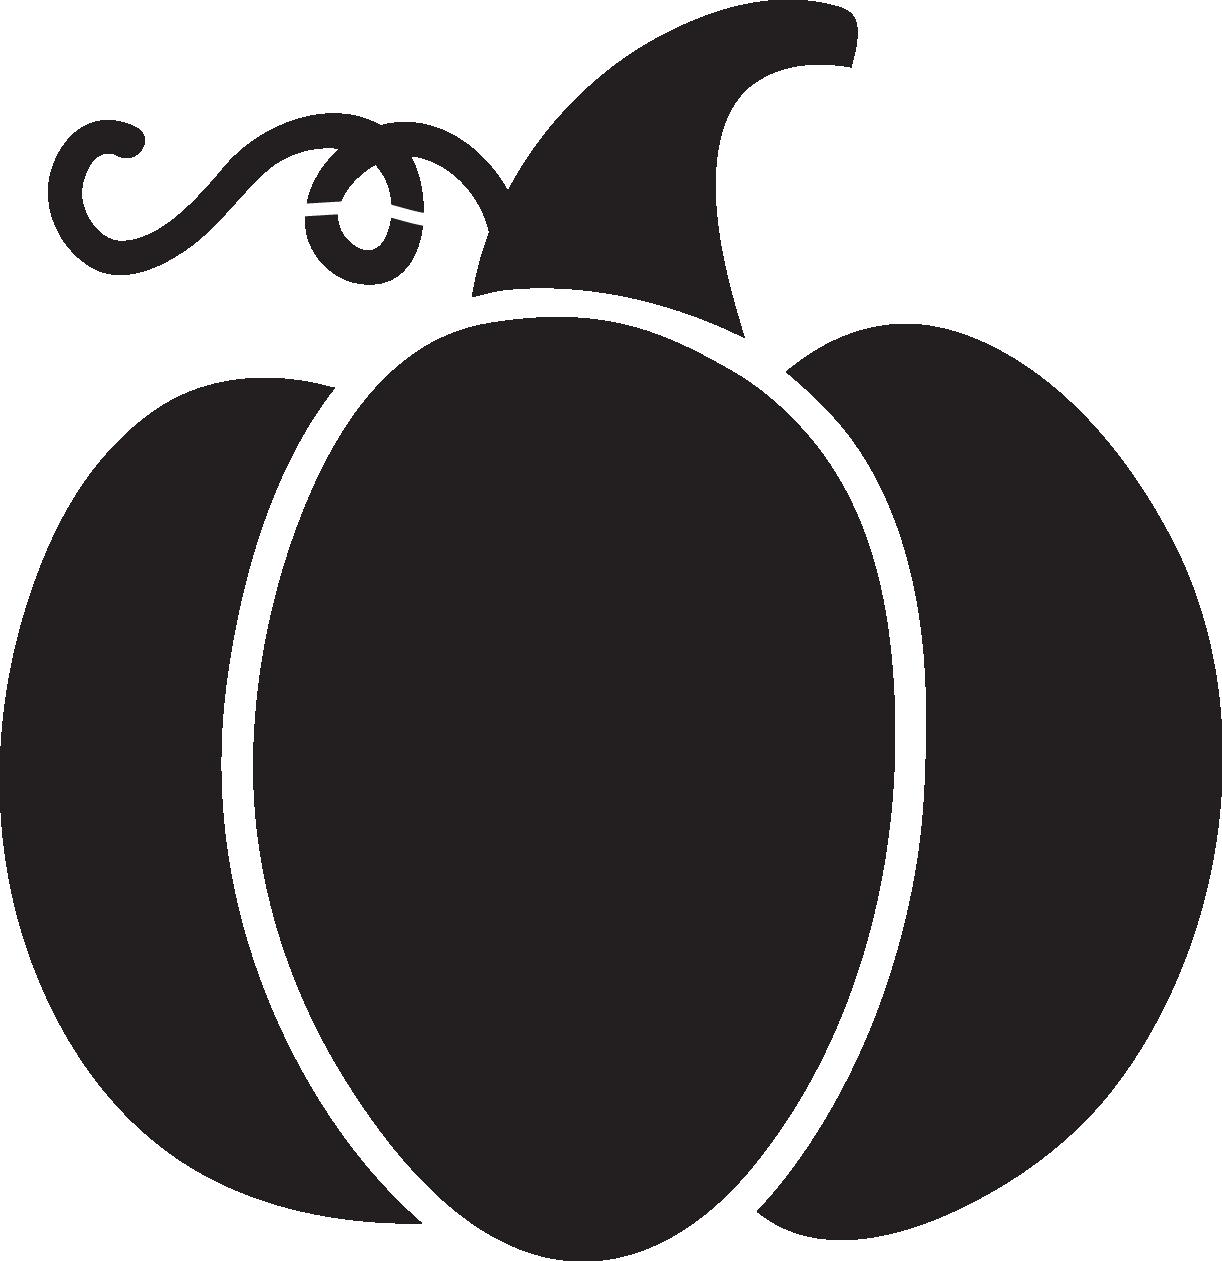 Pumpkin Silhouette Png